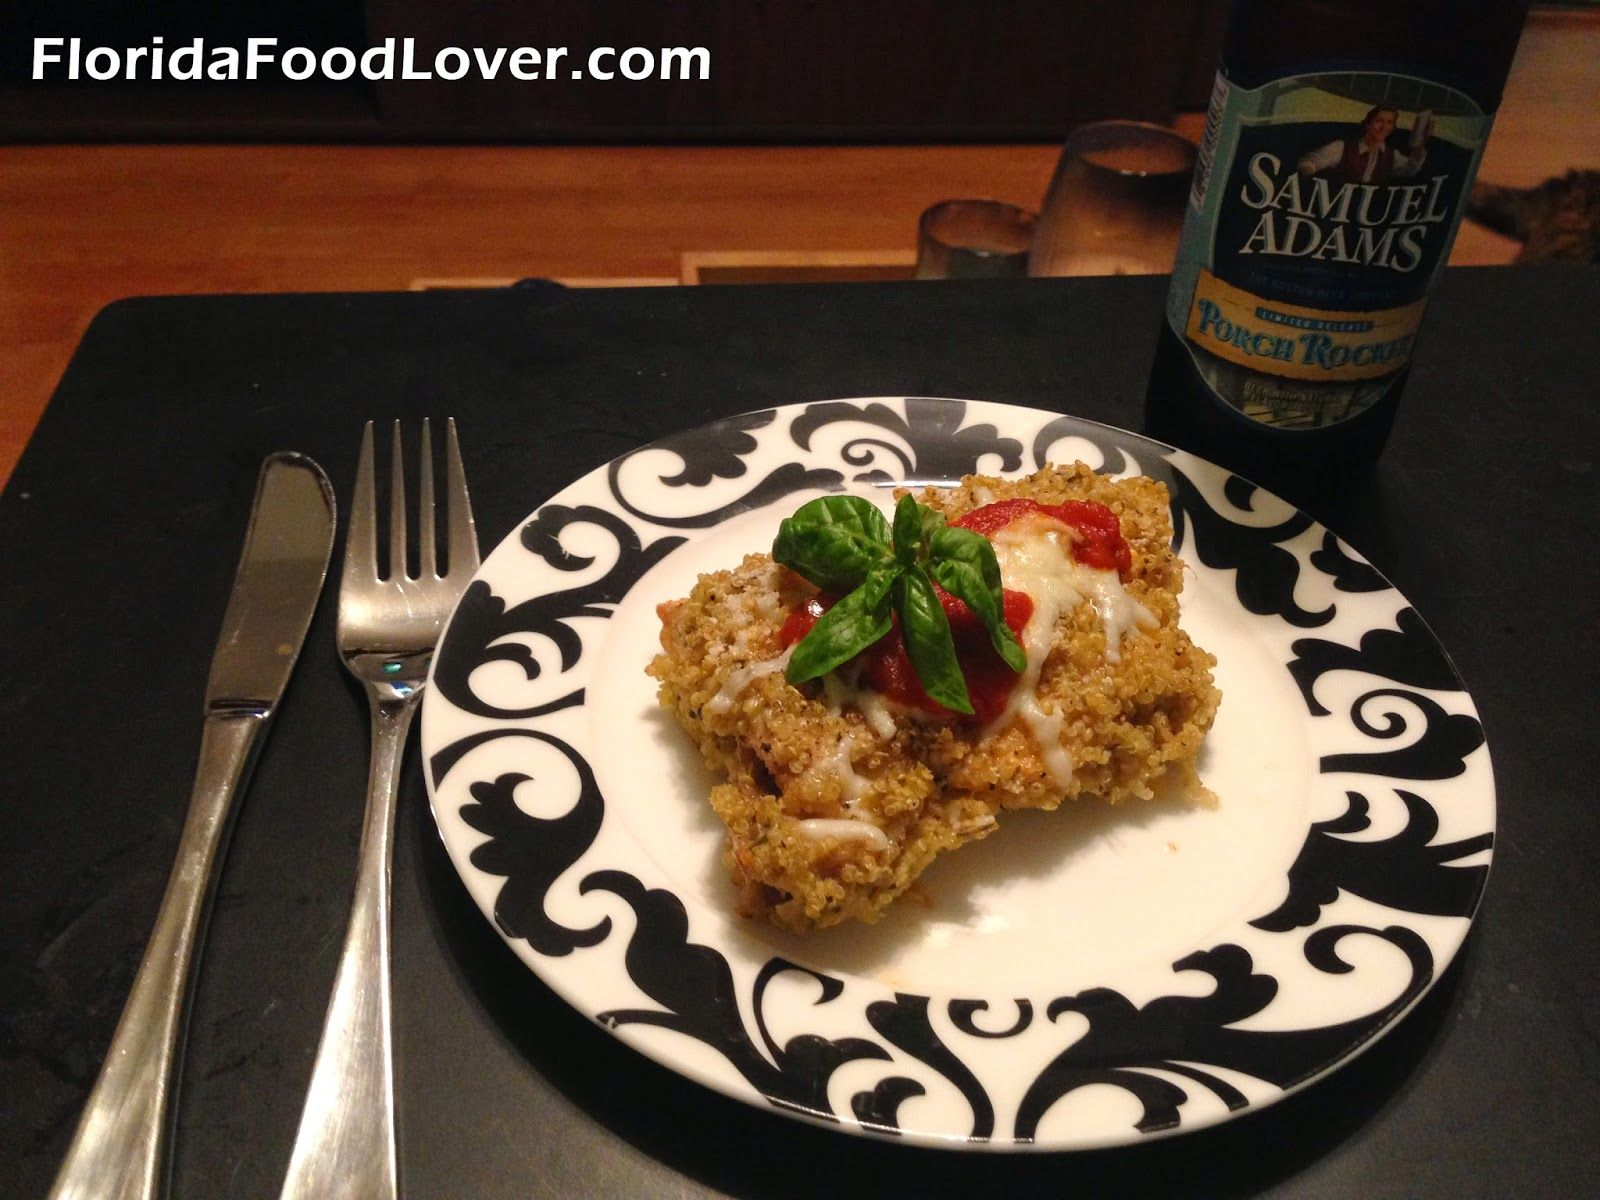 Quinoa chicken parmesan florida food lover florida food lover quinoa chicken parmesan florida food lover forumfinder Choice Image